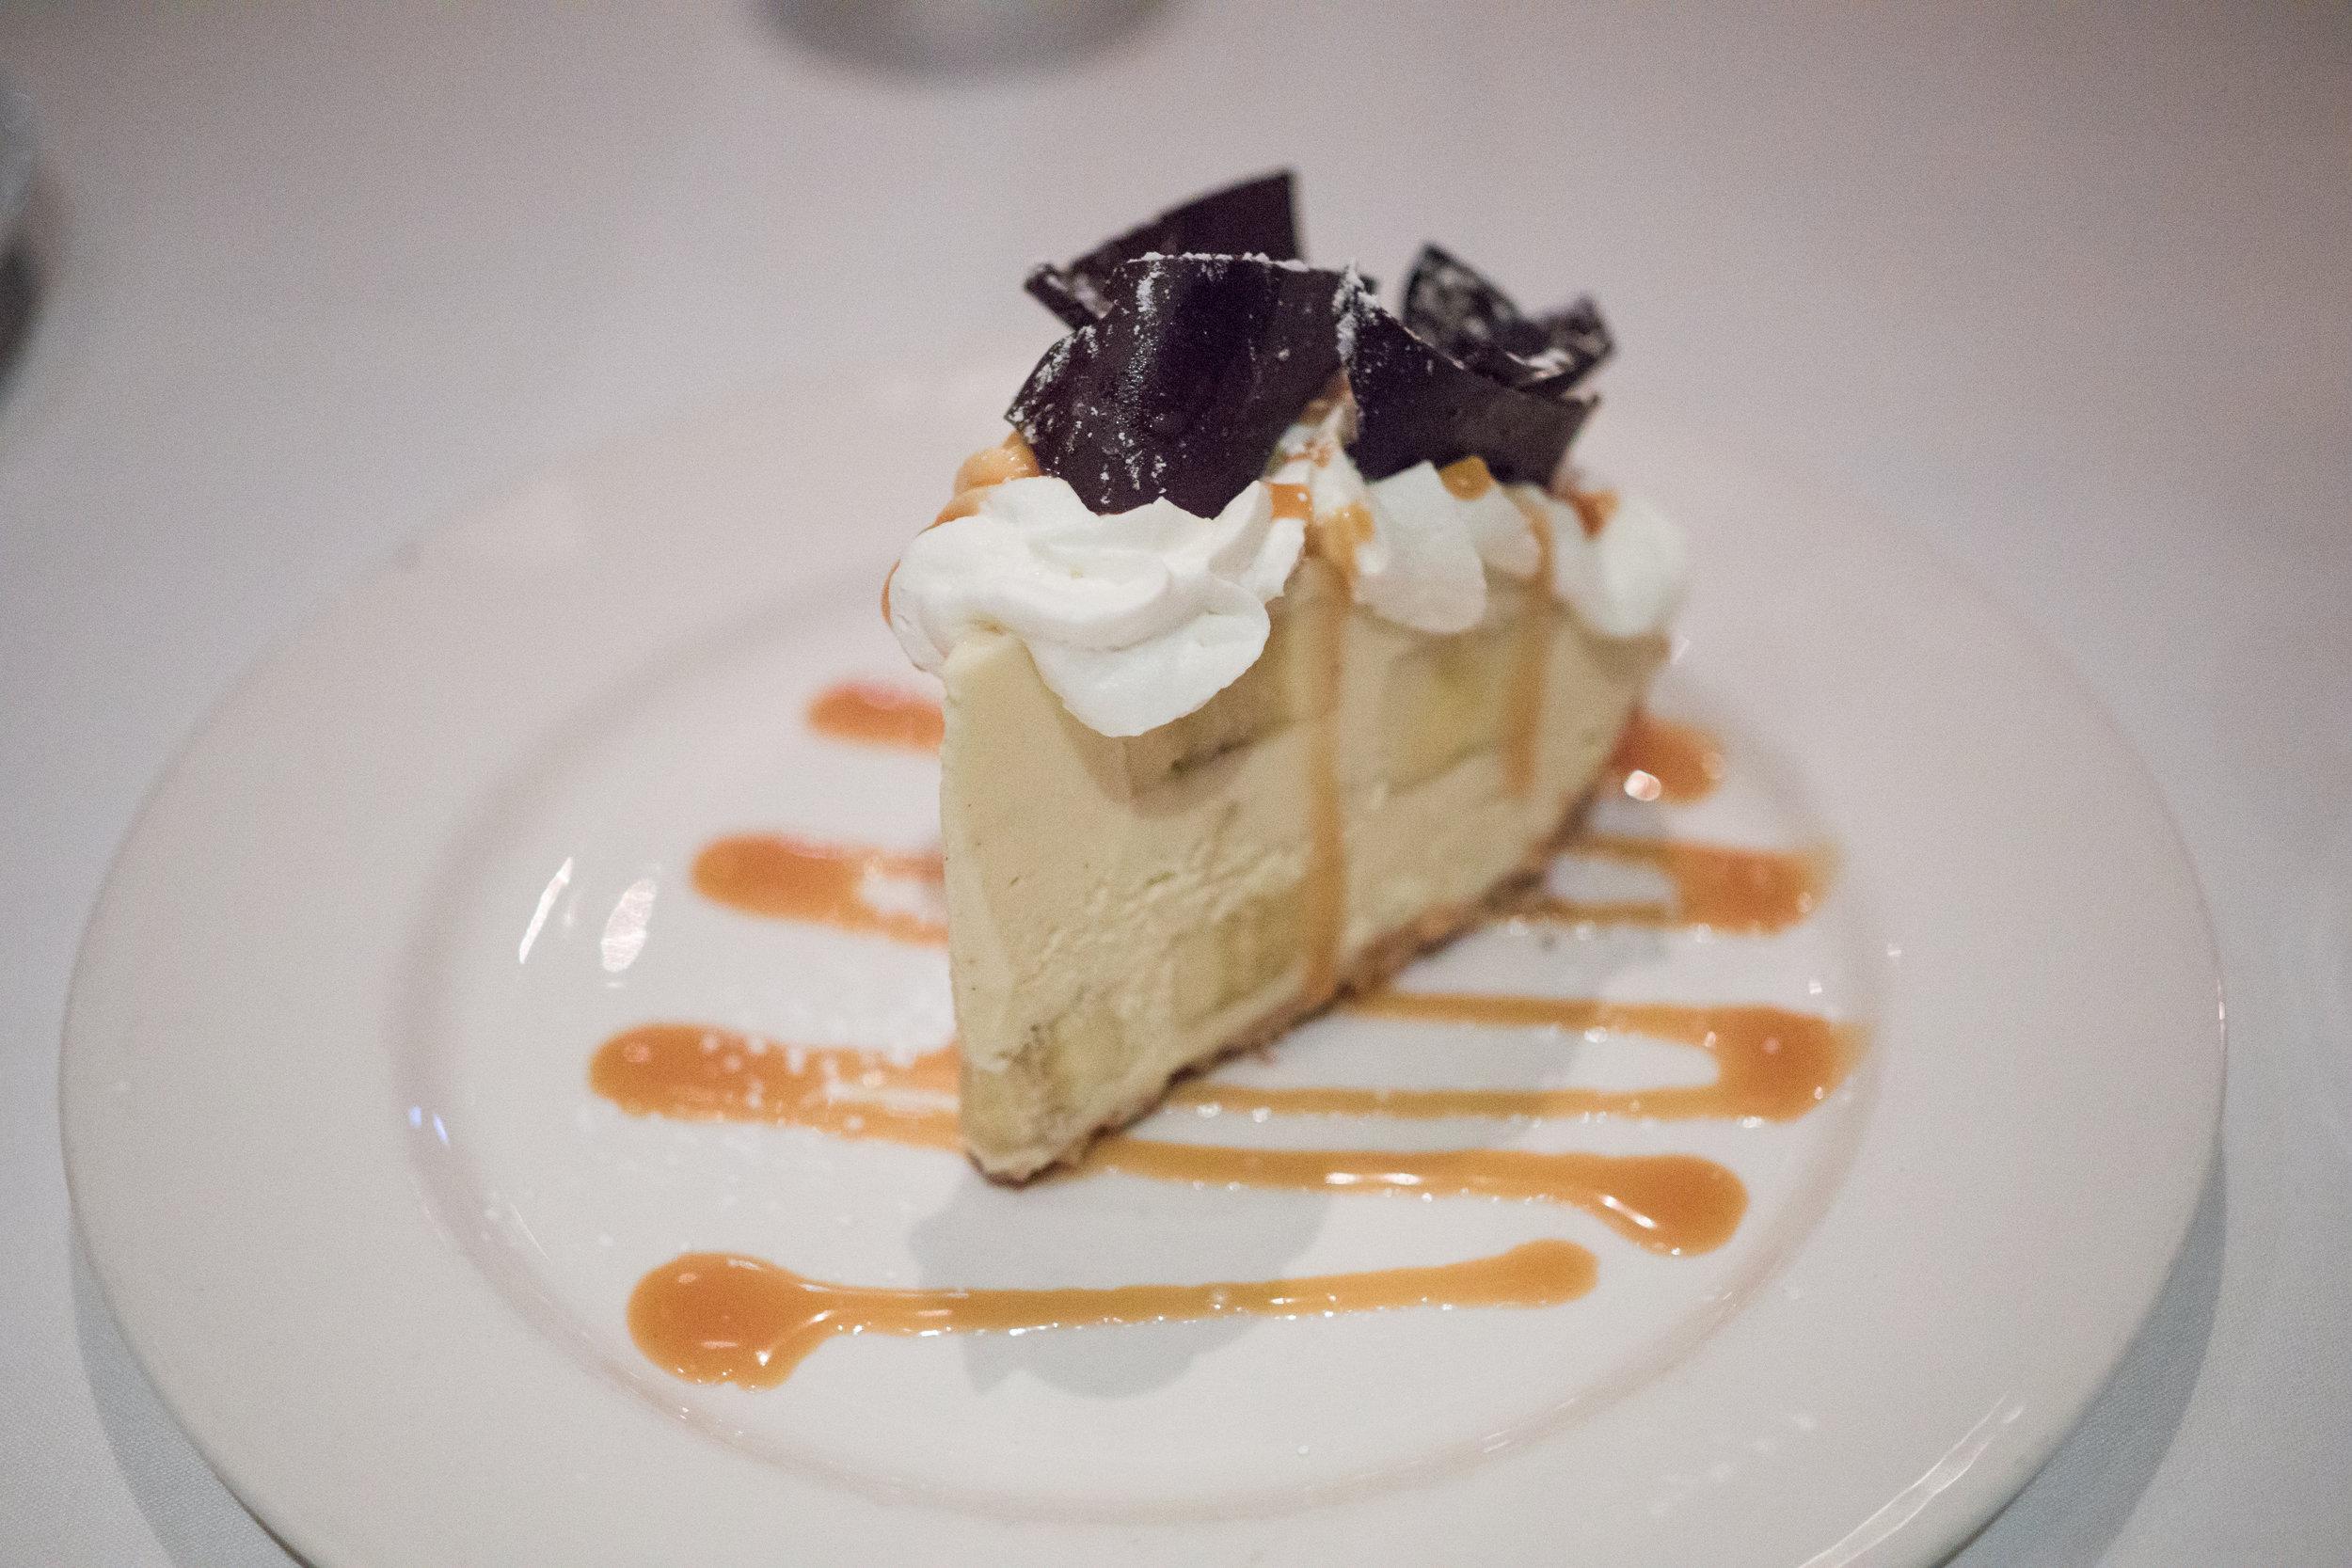 The cream of the banana cream pie is inspirational.